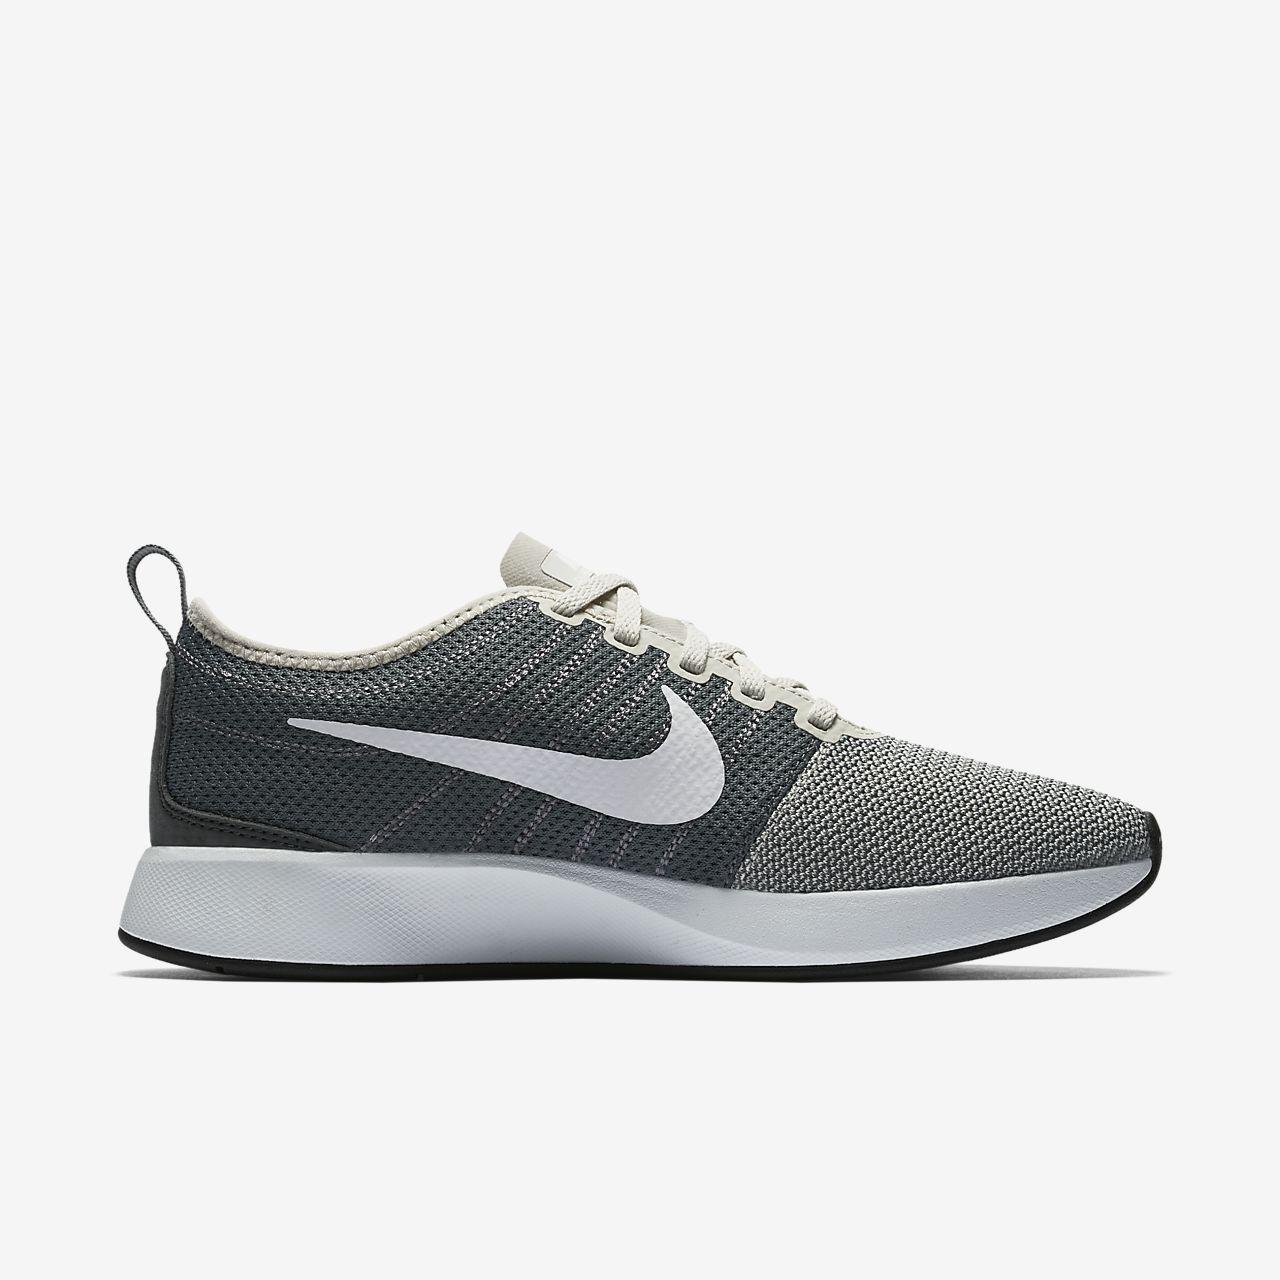 NIKE W Nike Dualtone Racer 917682-004 LIGHT BONE Size 6.5